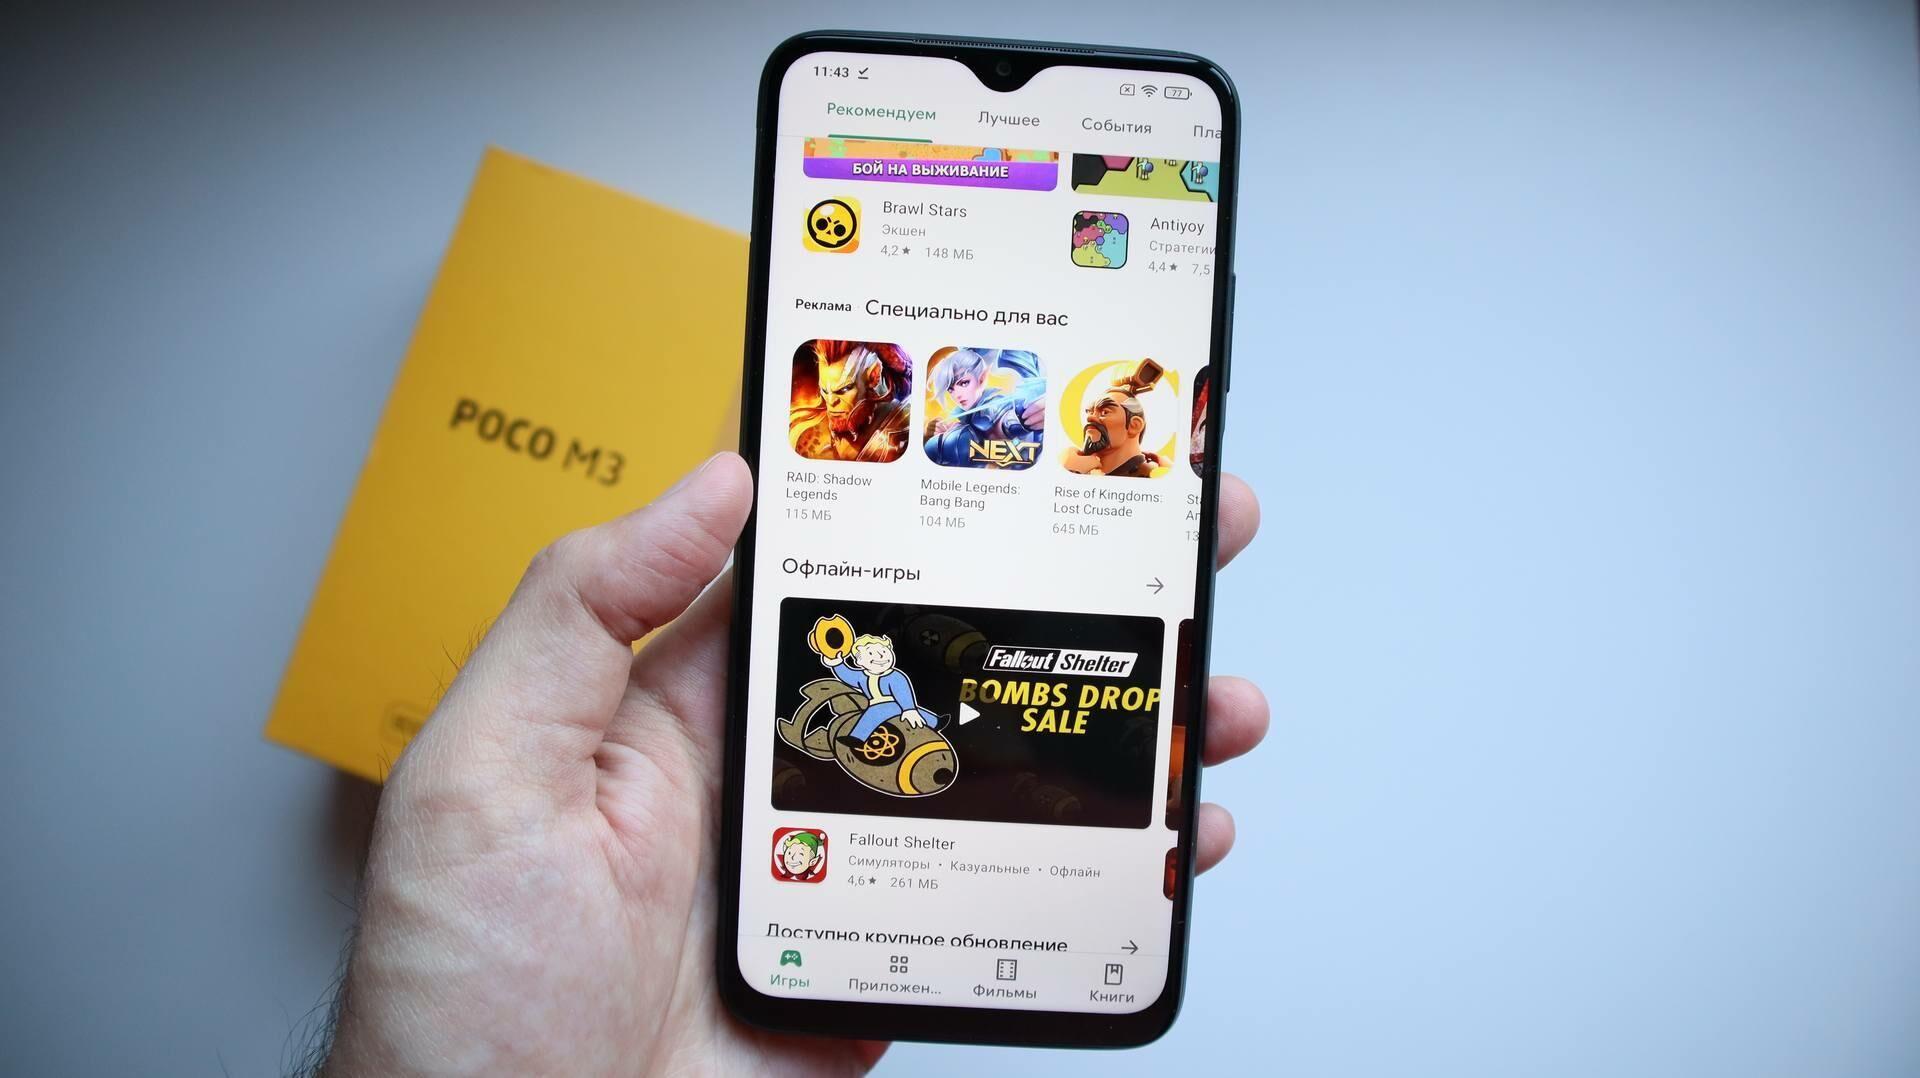 Обзор Poco M3: антикризисный смартфон с гигантским аккумулятором